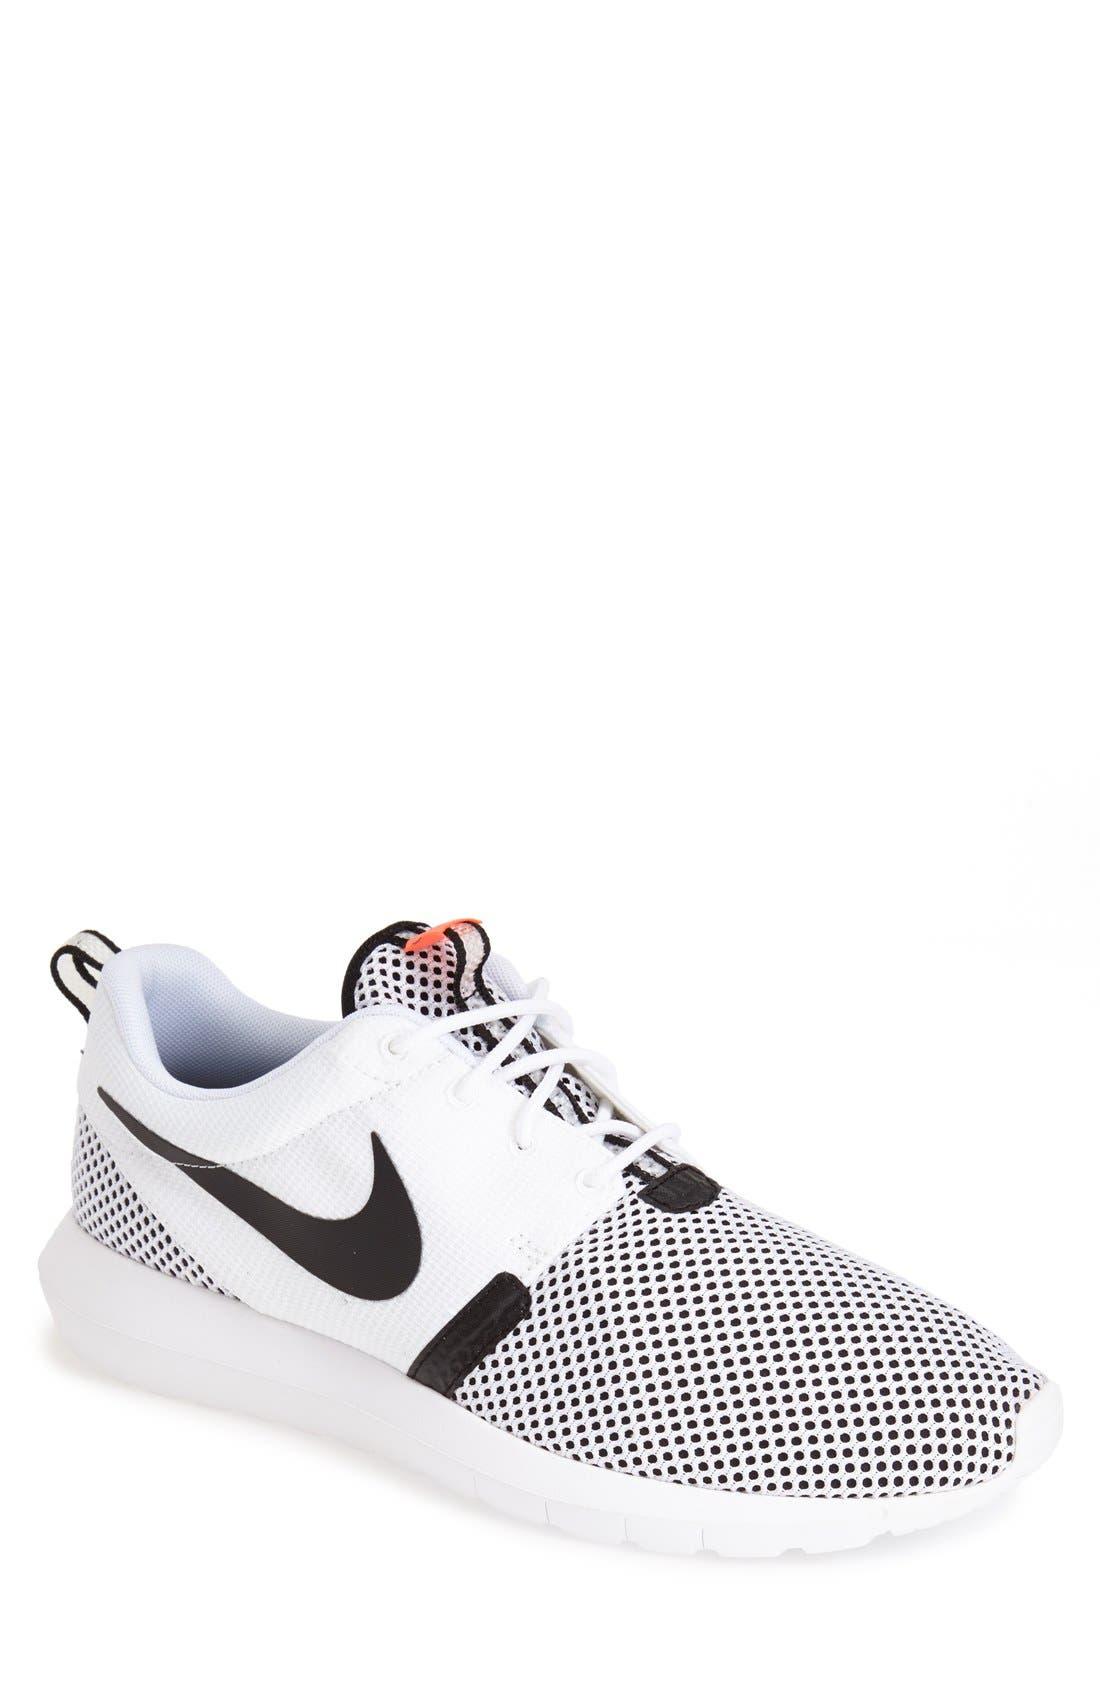 'Roshe Run NM Breeze' Sneaker,                             Main thumbnail 1, color,                             100